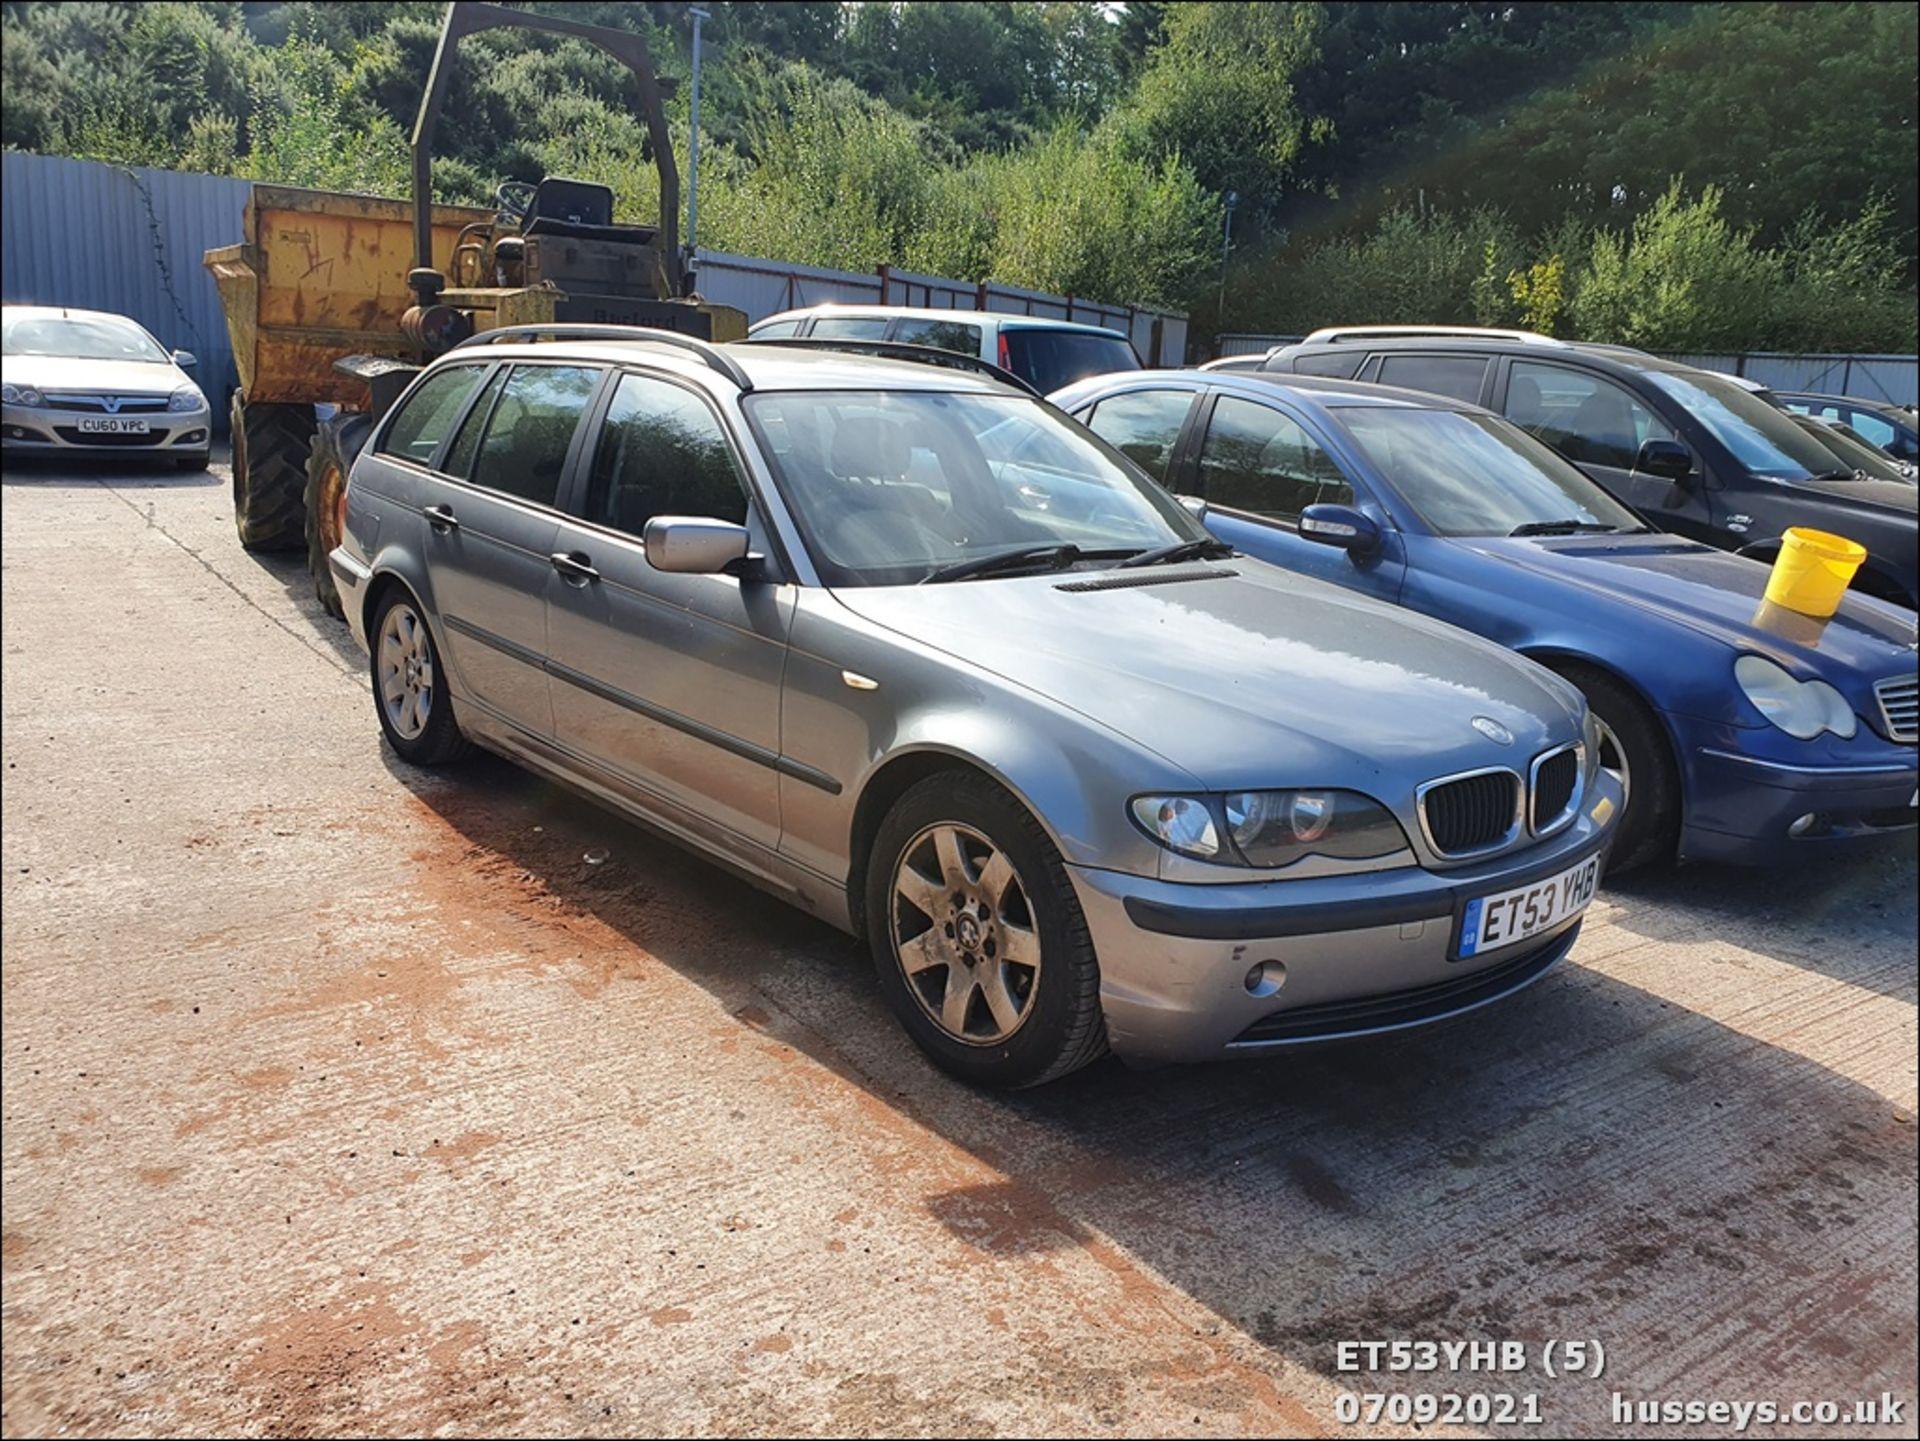 04/53 BMW 318I SE TOURING - 1995cc 5dr Estate (Grey) - Image 5 of 16